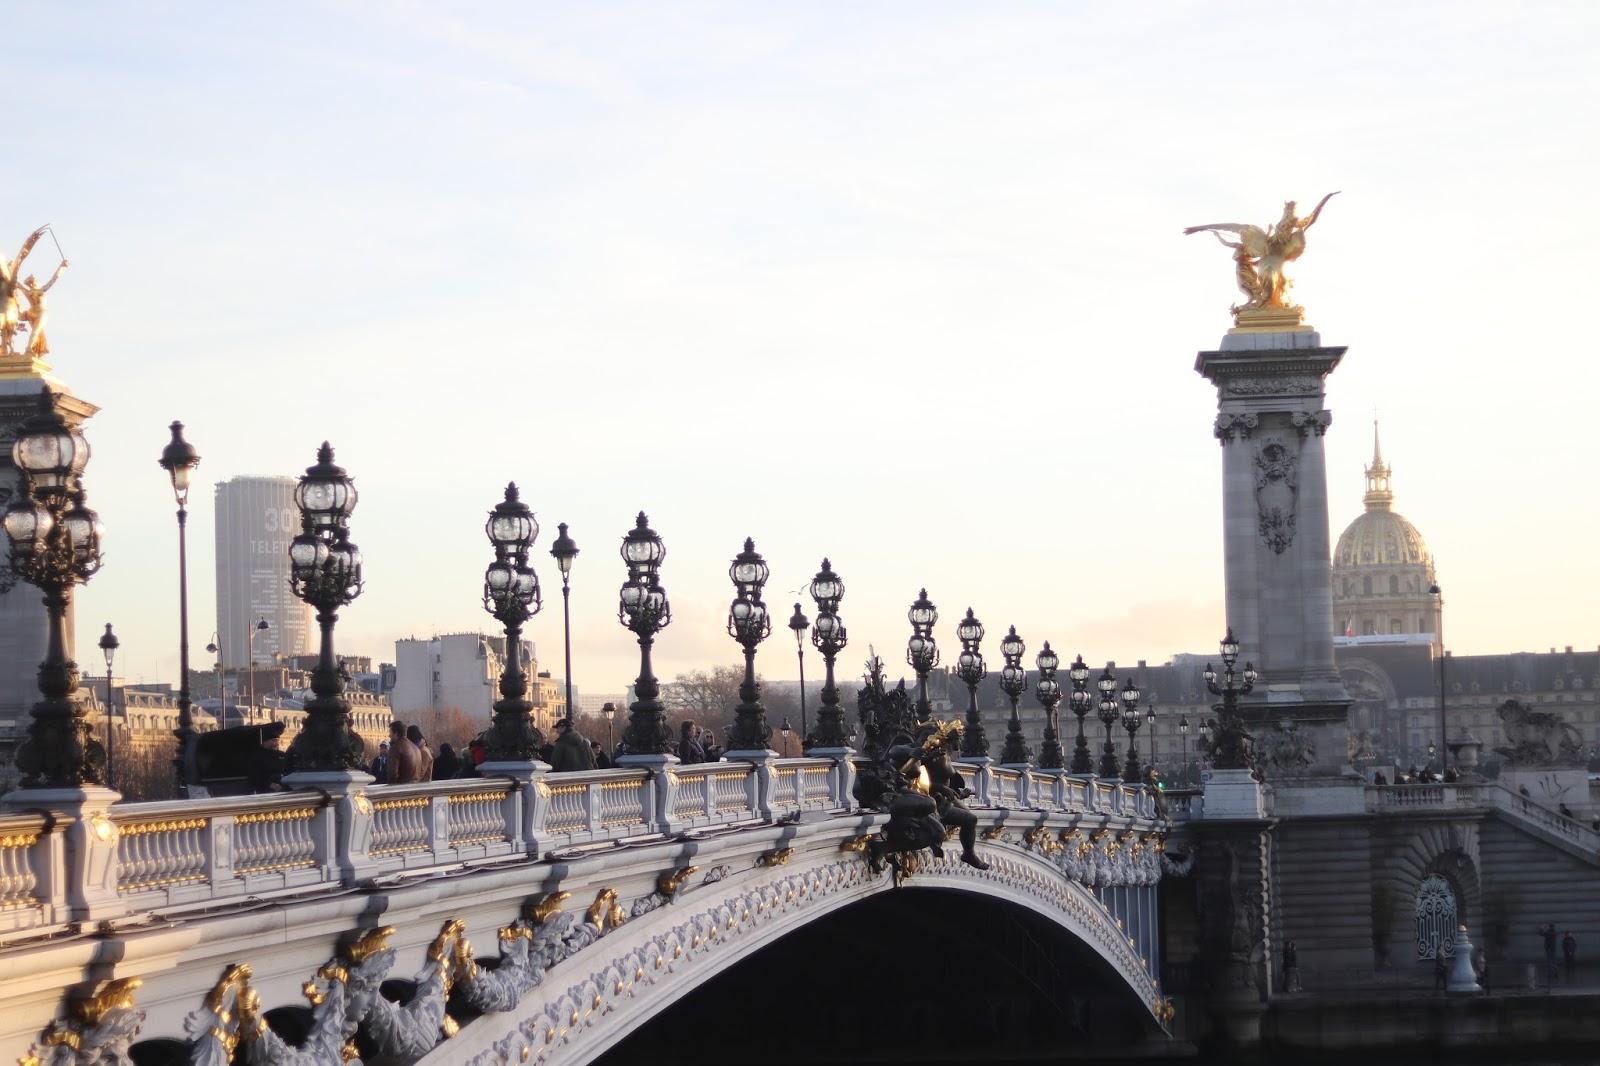 Pont Alexandre III Bridge, Paris, France, KALANCHOE